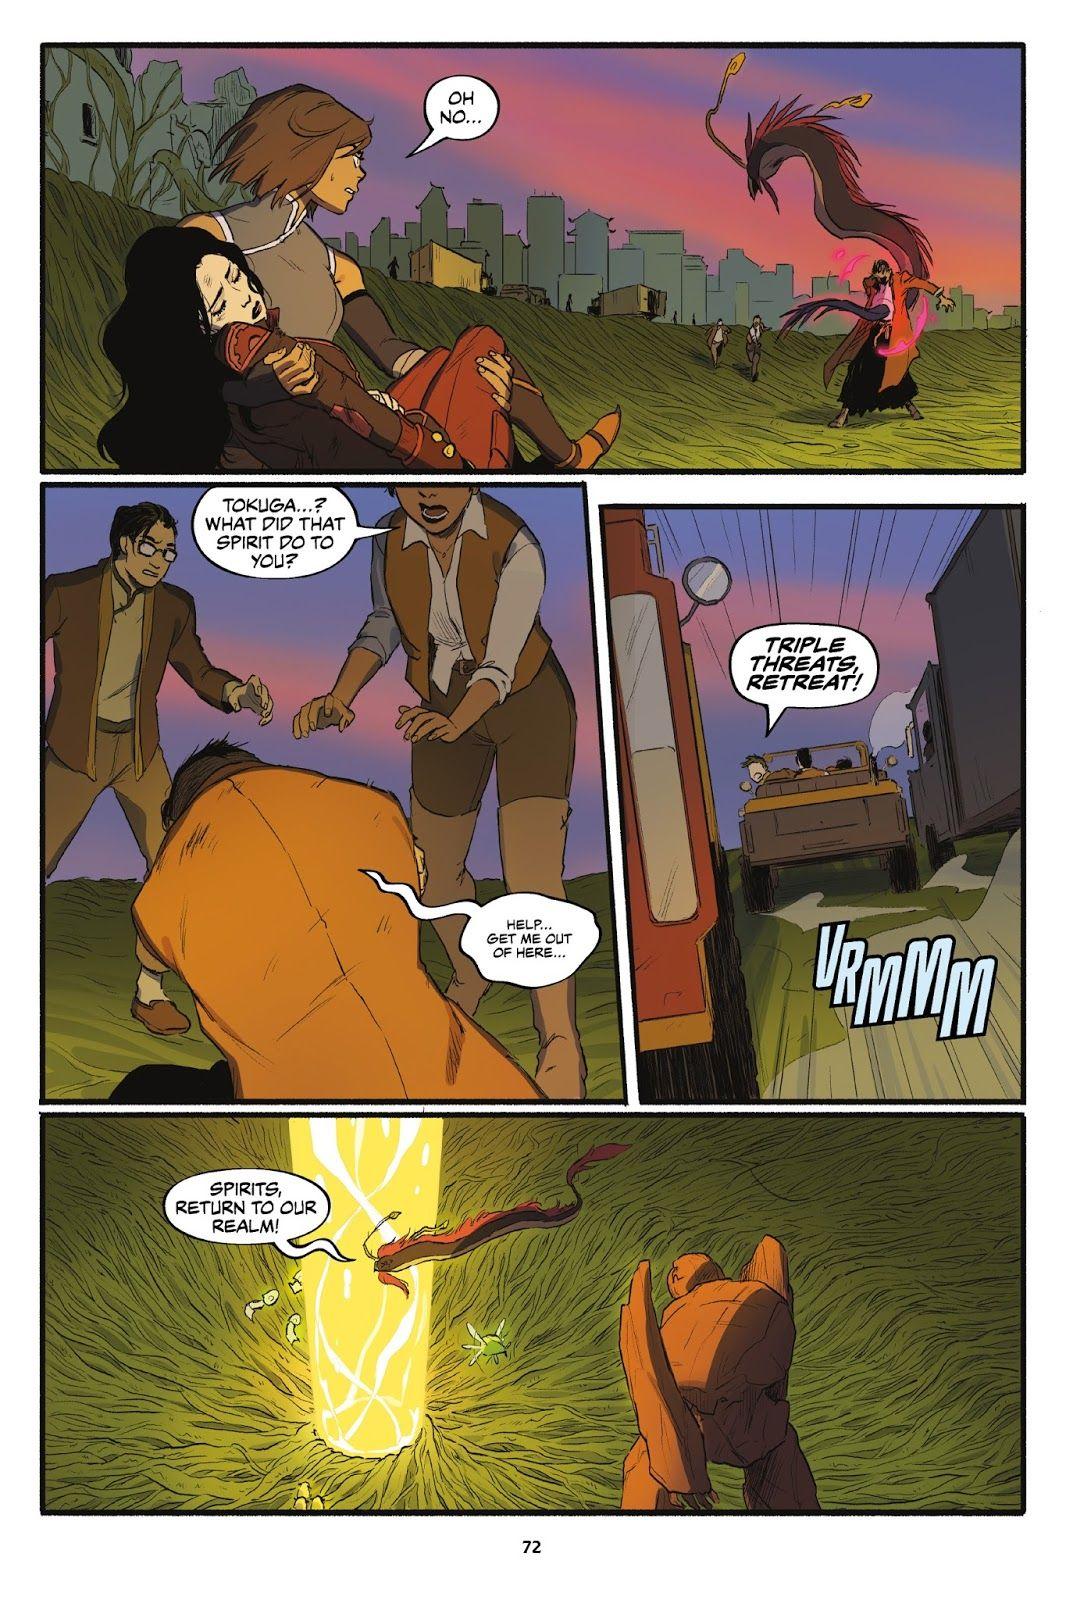 nickelodeon the legend of korra turf wars issue 1 read